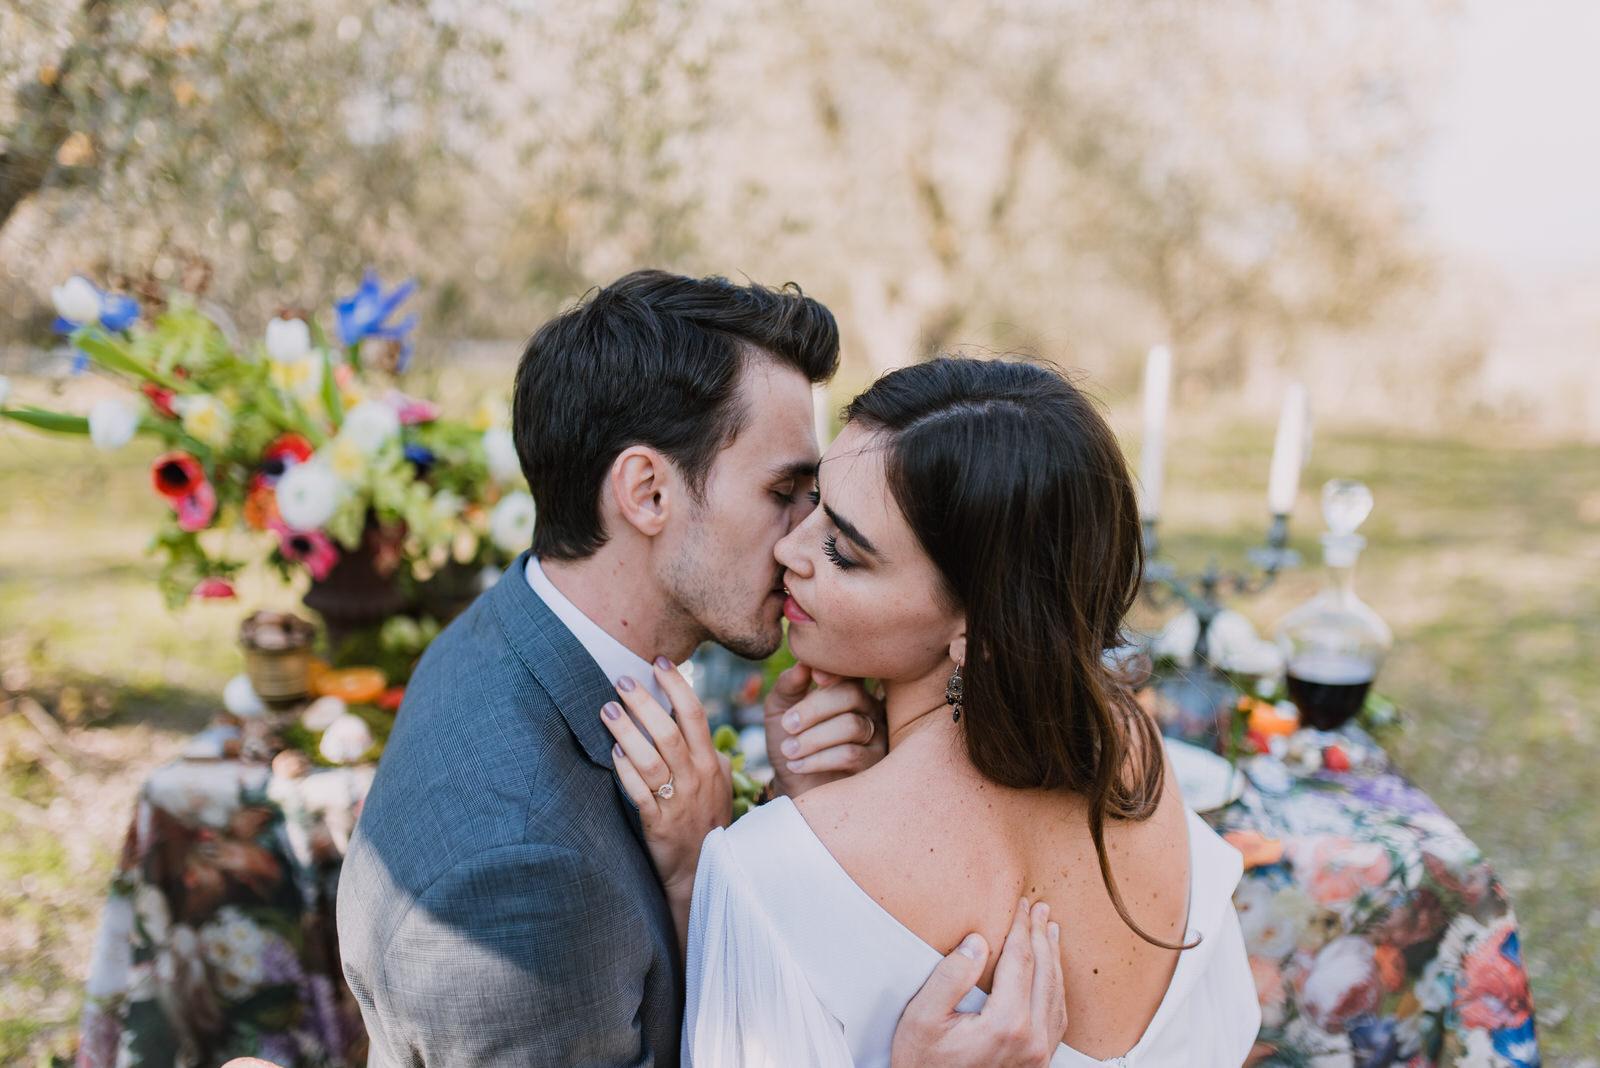 tuscany wedding photography 58.jpg